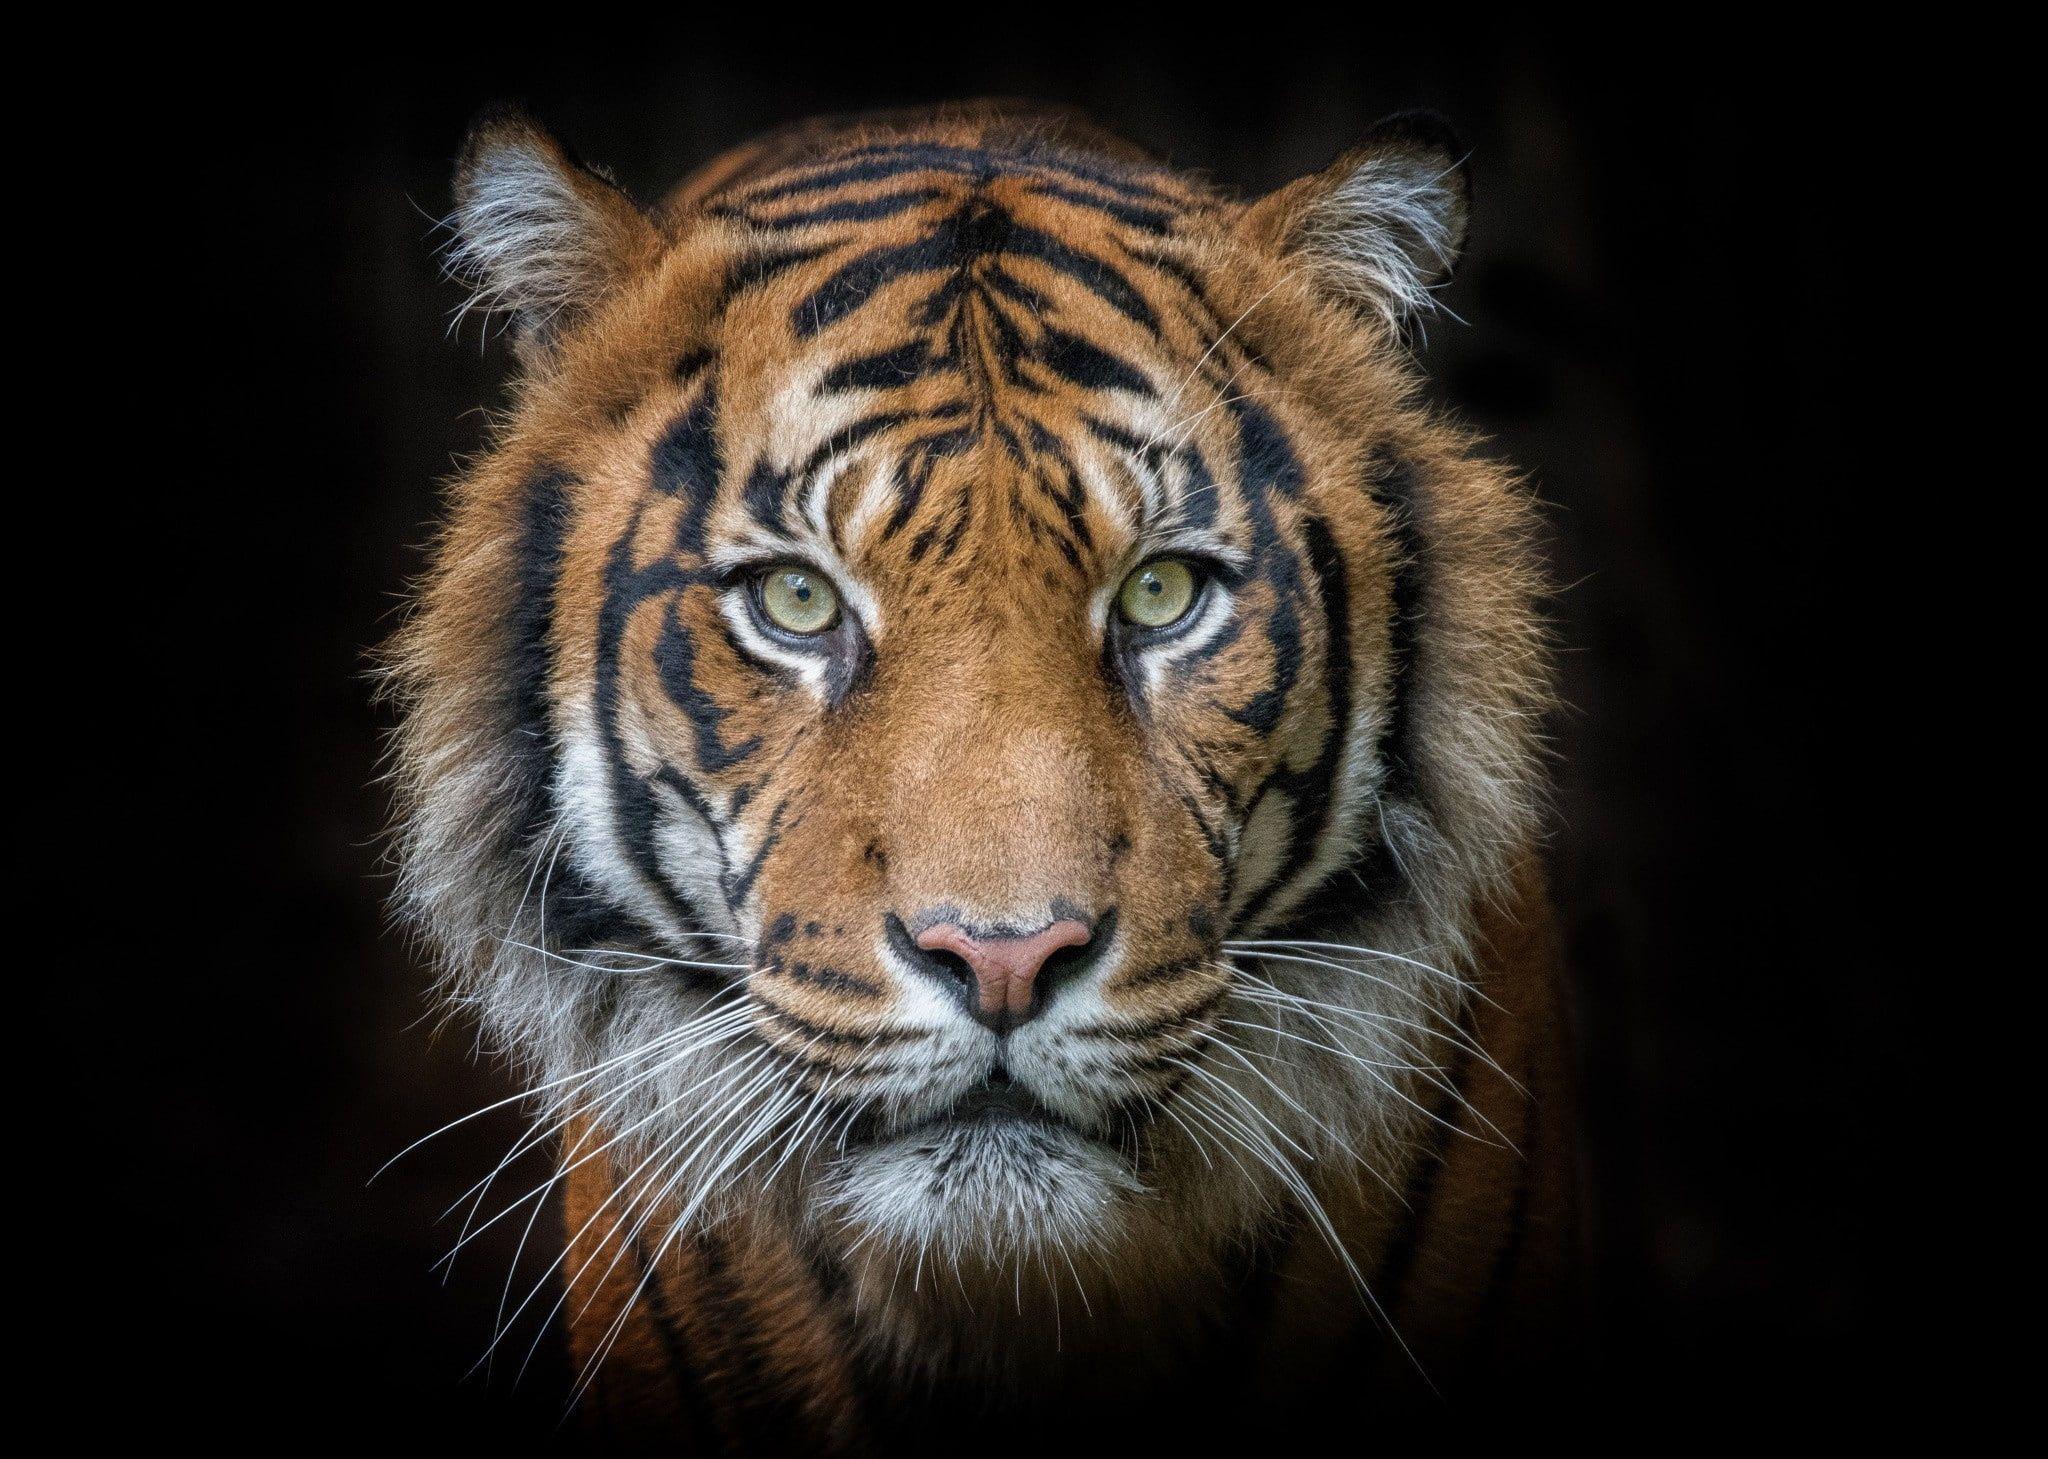 Tiger Portrait Tiger Animal Tiger Portrait Eyes Muzzle Predator Amazing Animals S Best S Hd 1080p Wallpaper H In 2020 Tiger Photography Pet Tiger Tiger Face